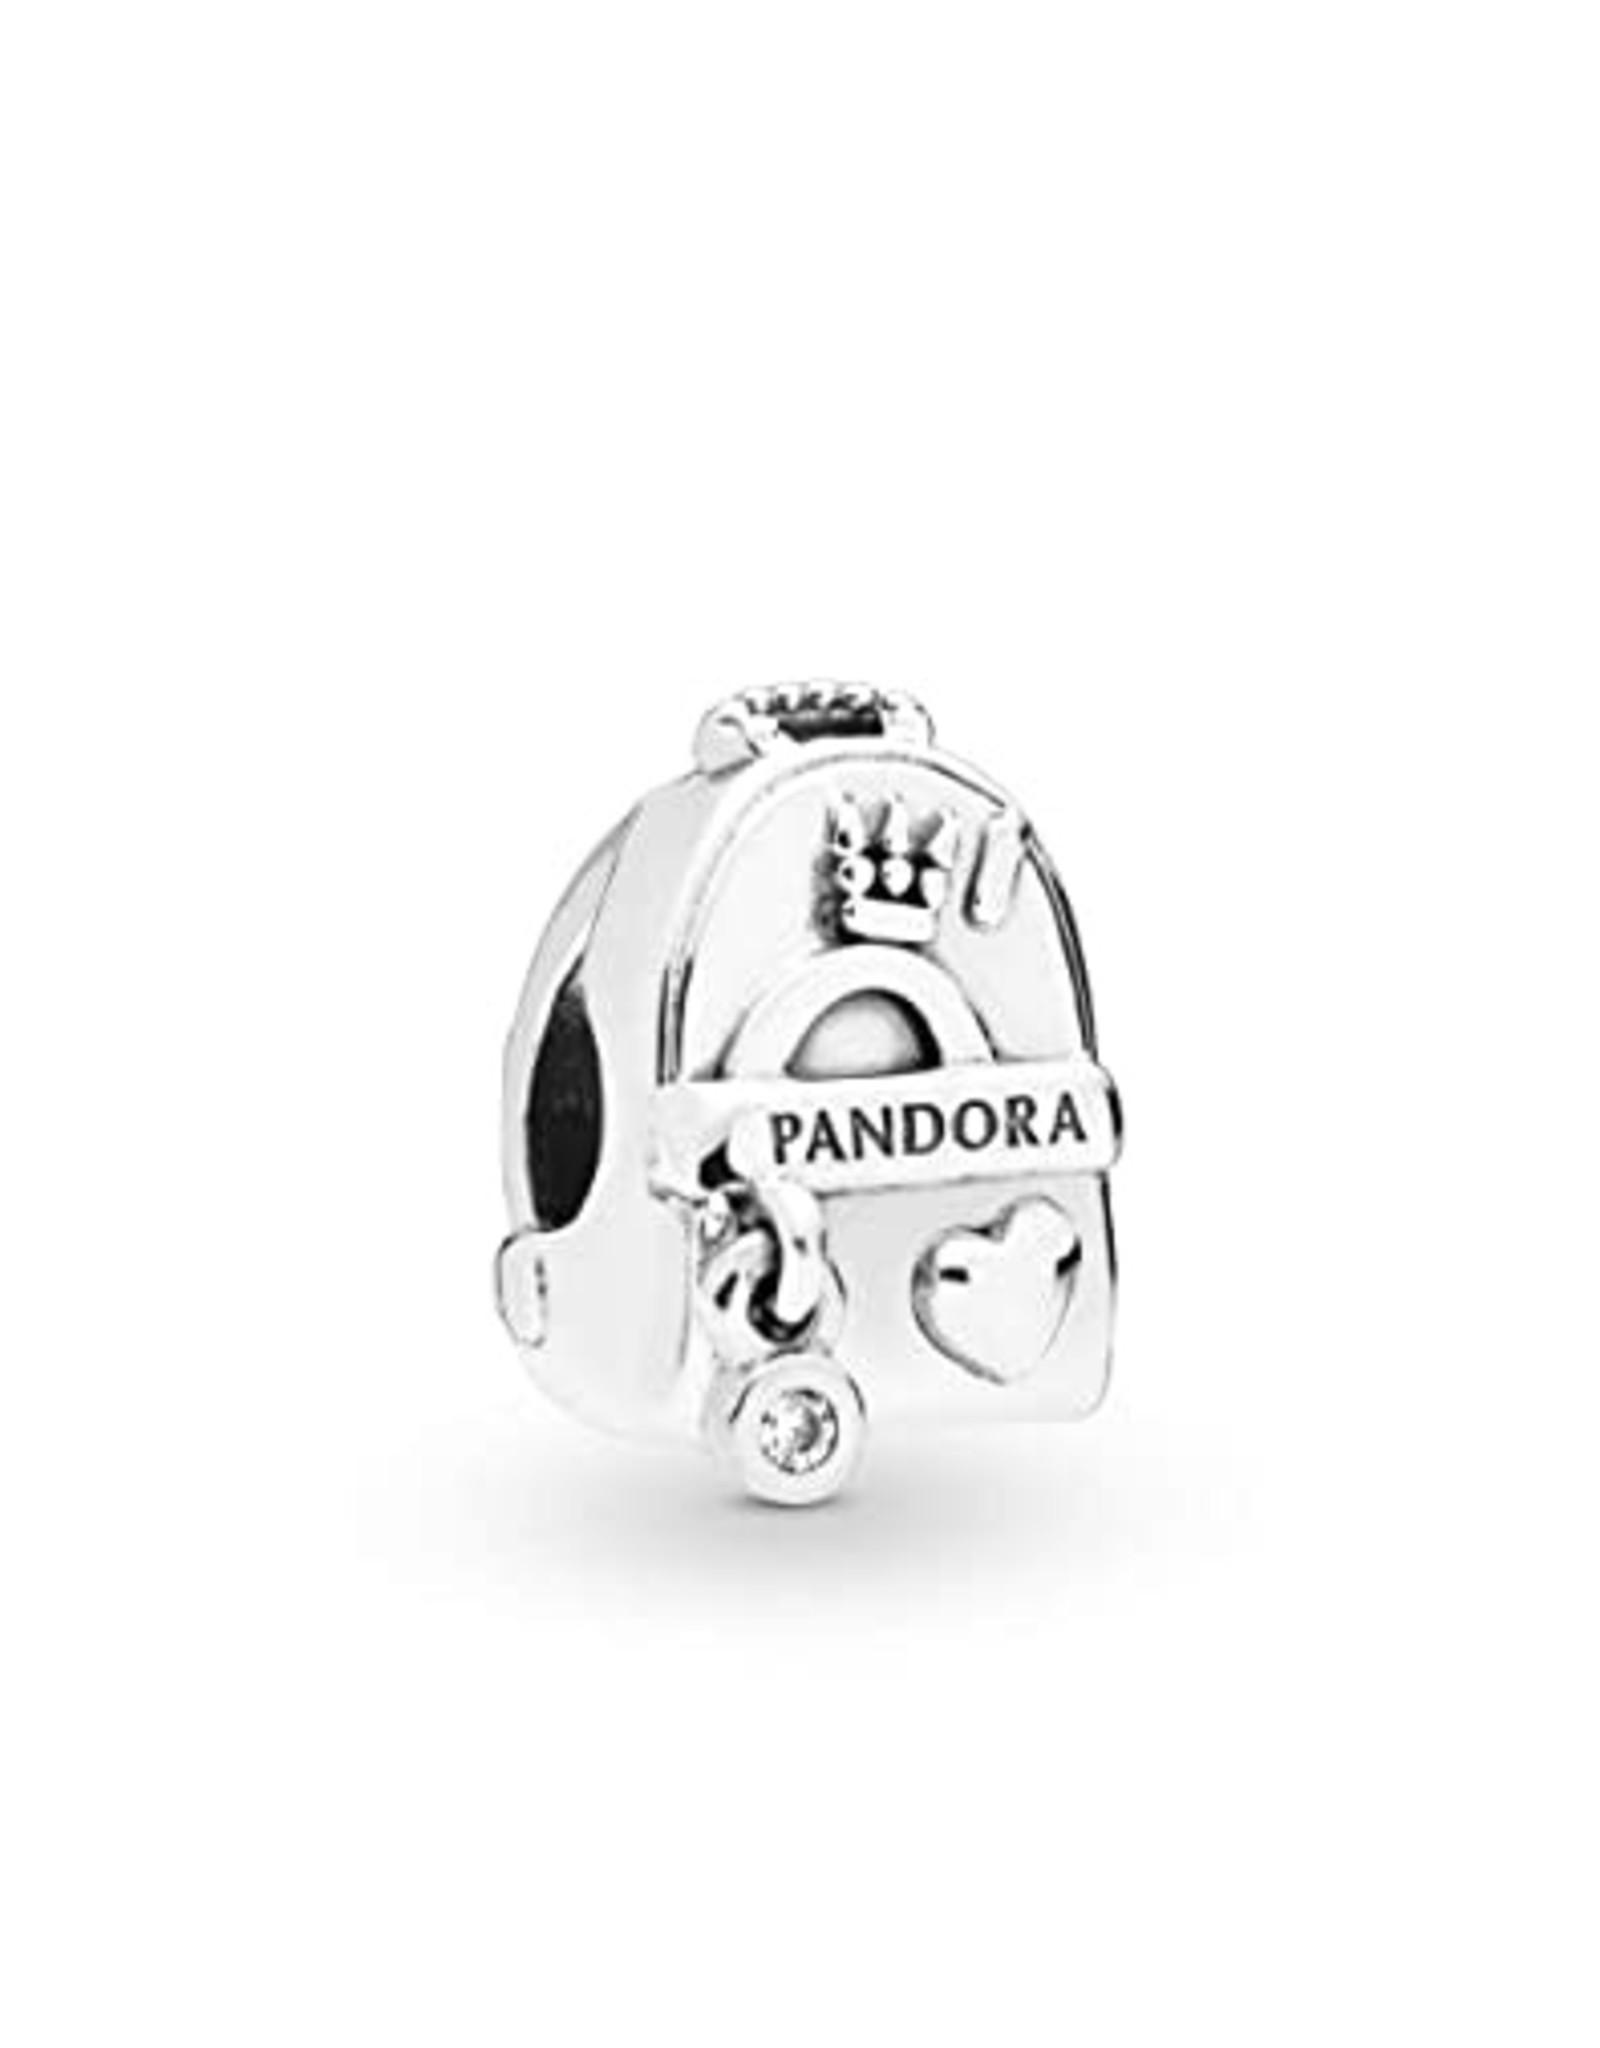 Pandora Pandora Charm, Adventure Bag, Clear CZ